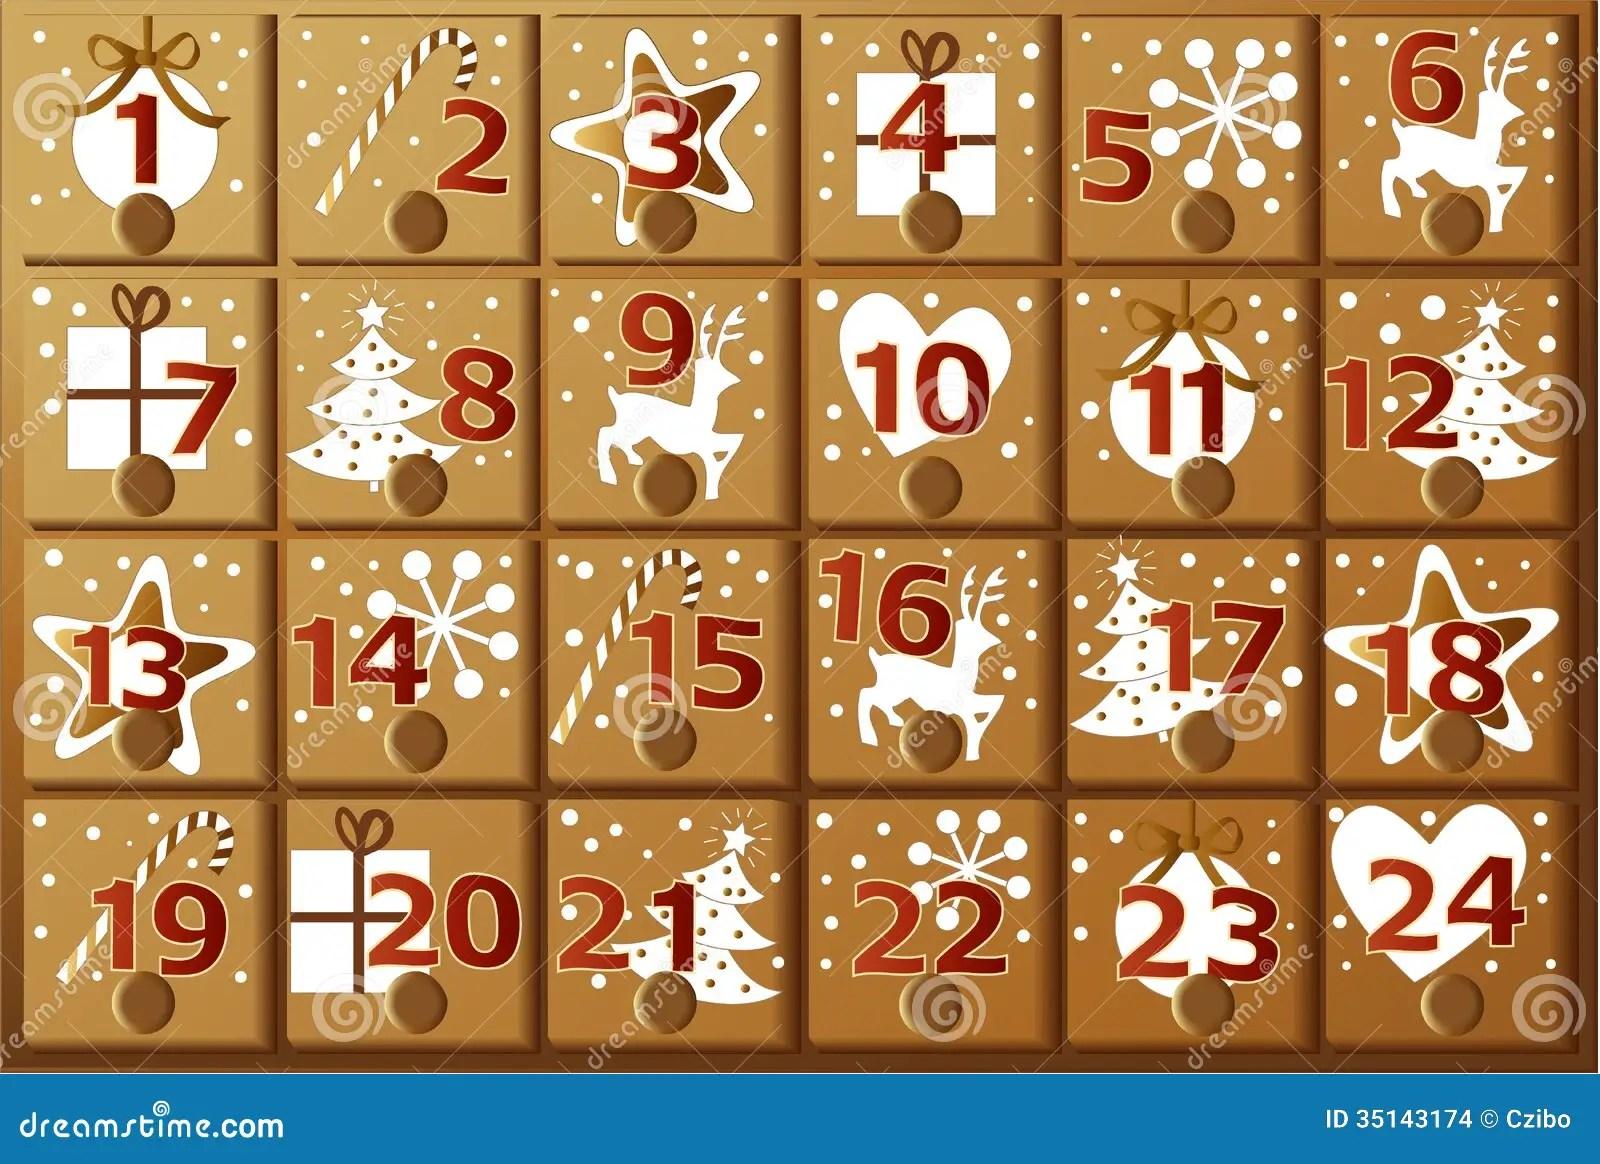 Funny Advent Calendar Online | Season for Christmas Add Vent Calendars